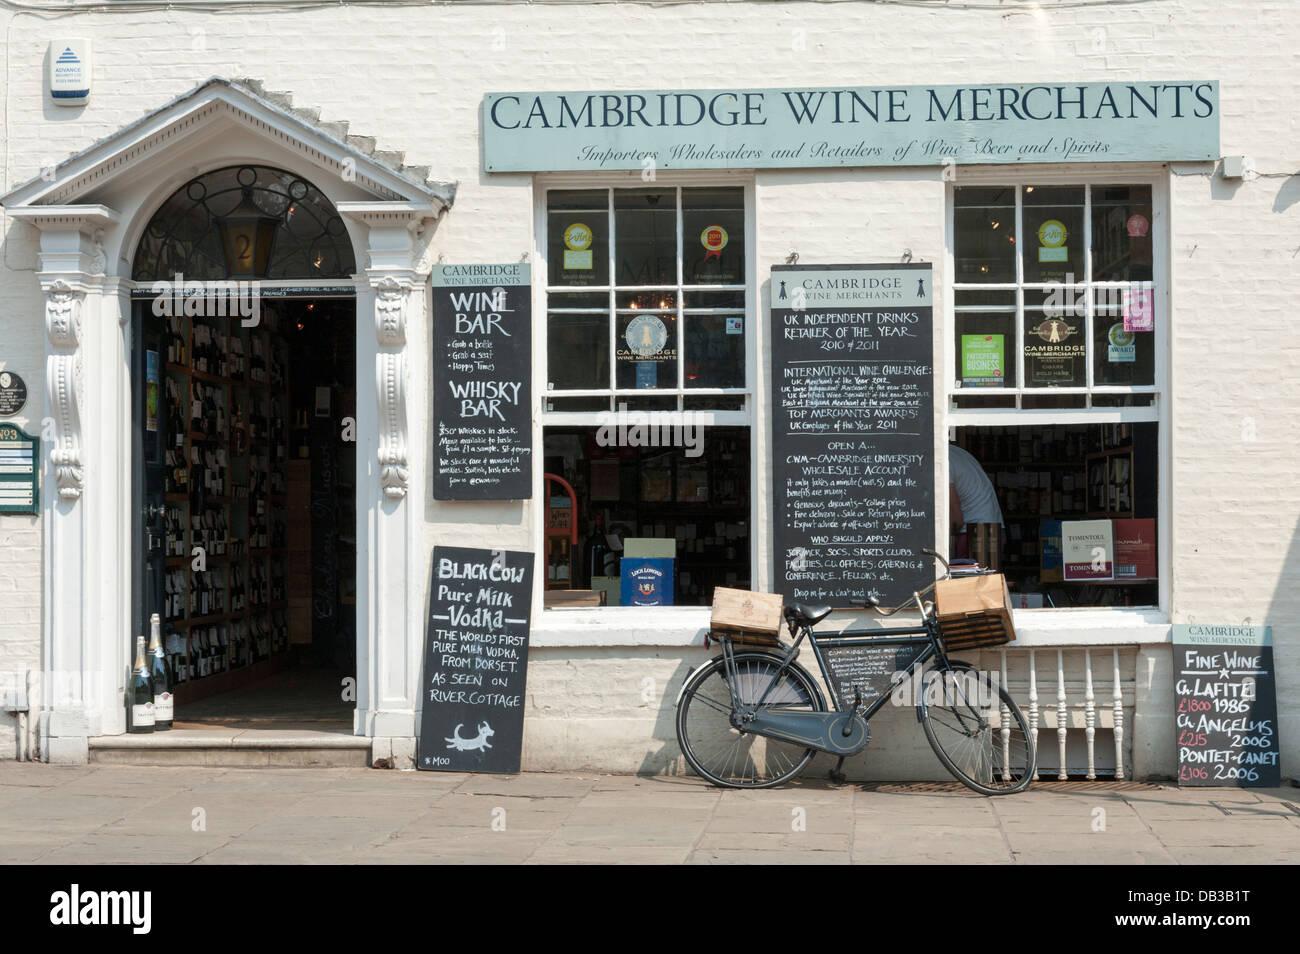 Cambridge Wine Merchants Shop King's Parade Cambridge UK - Stock Image